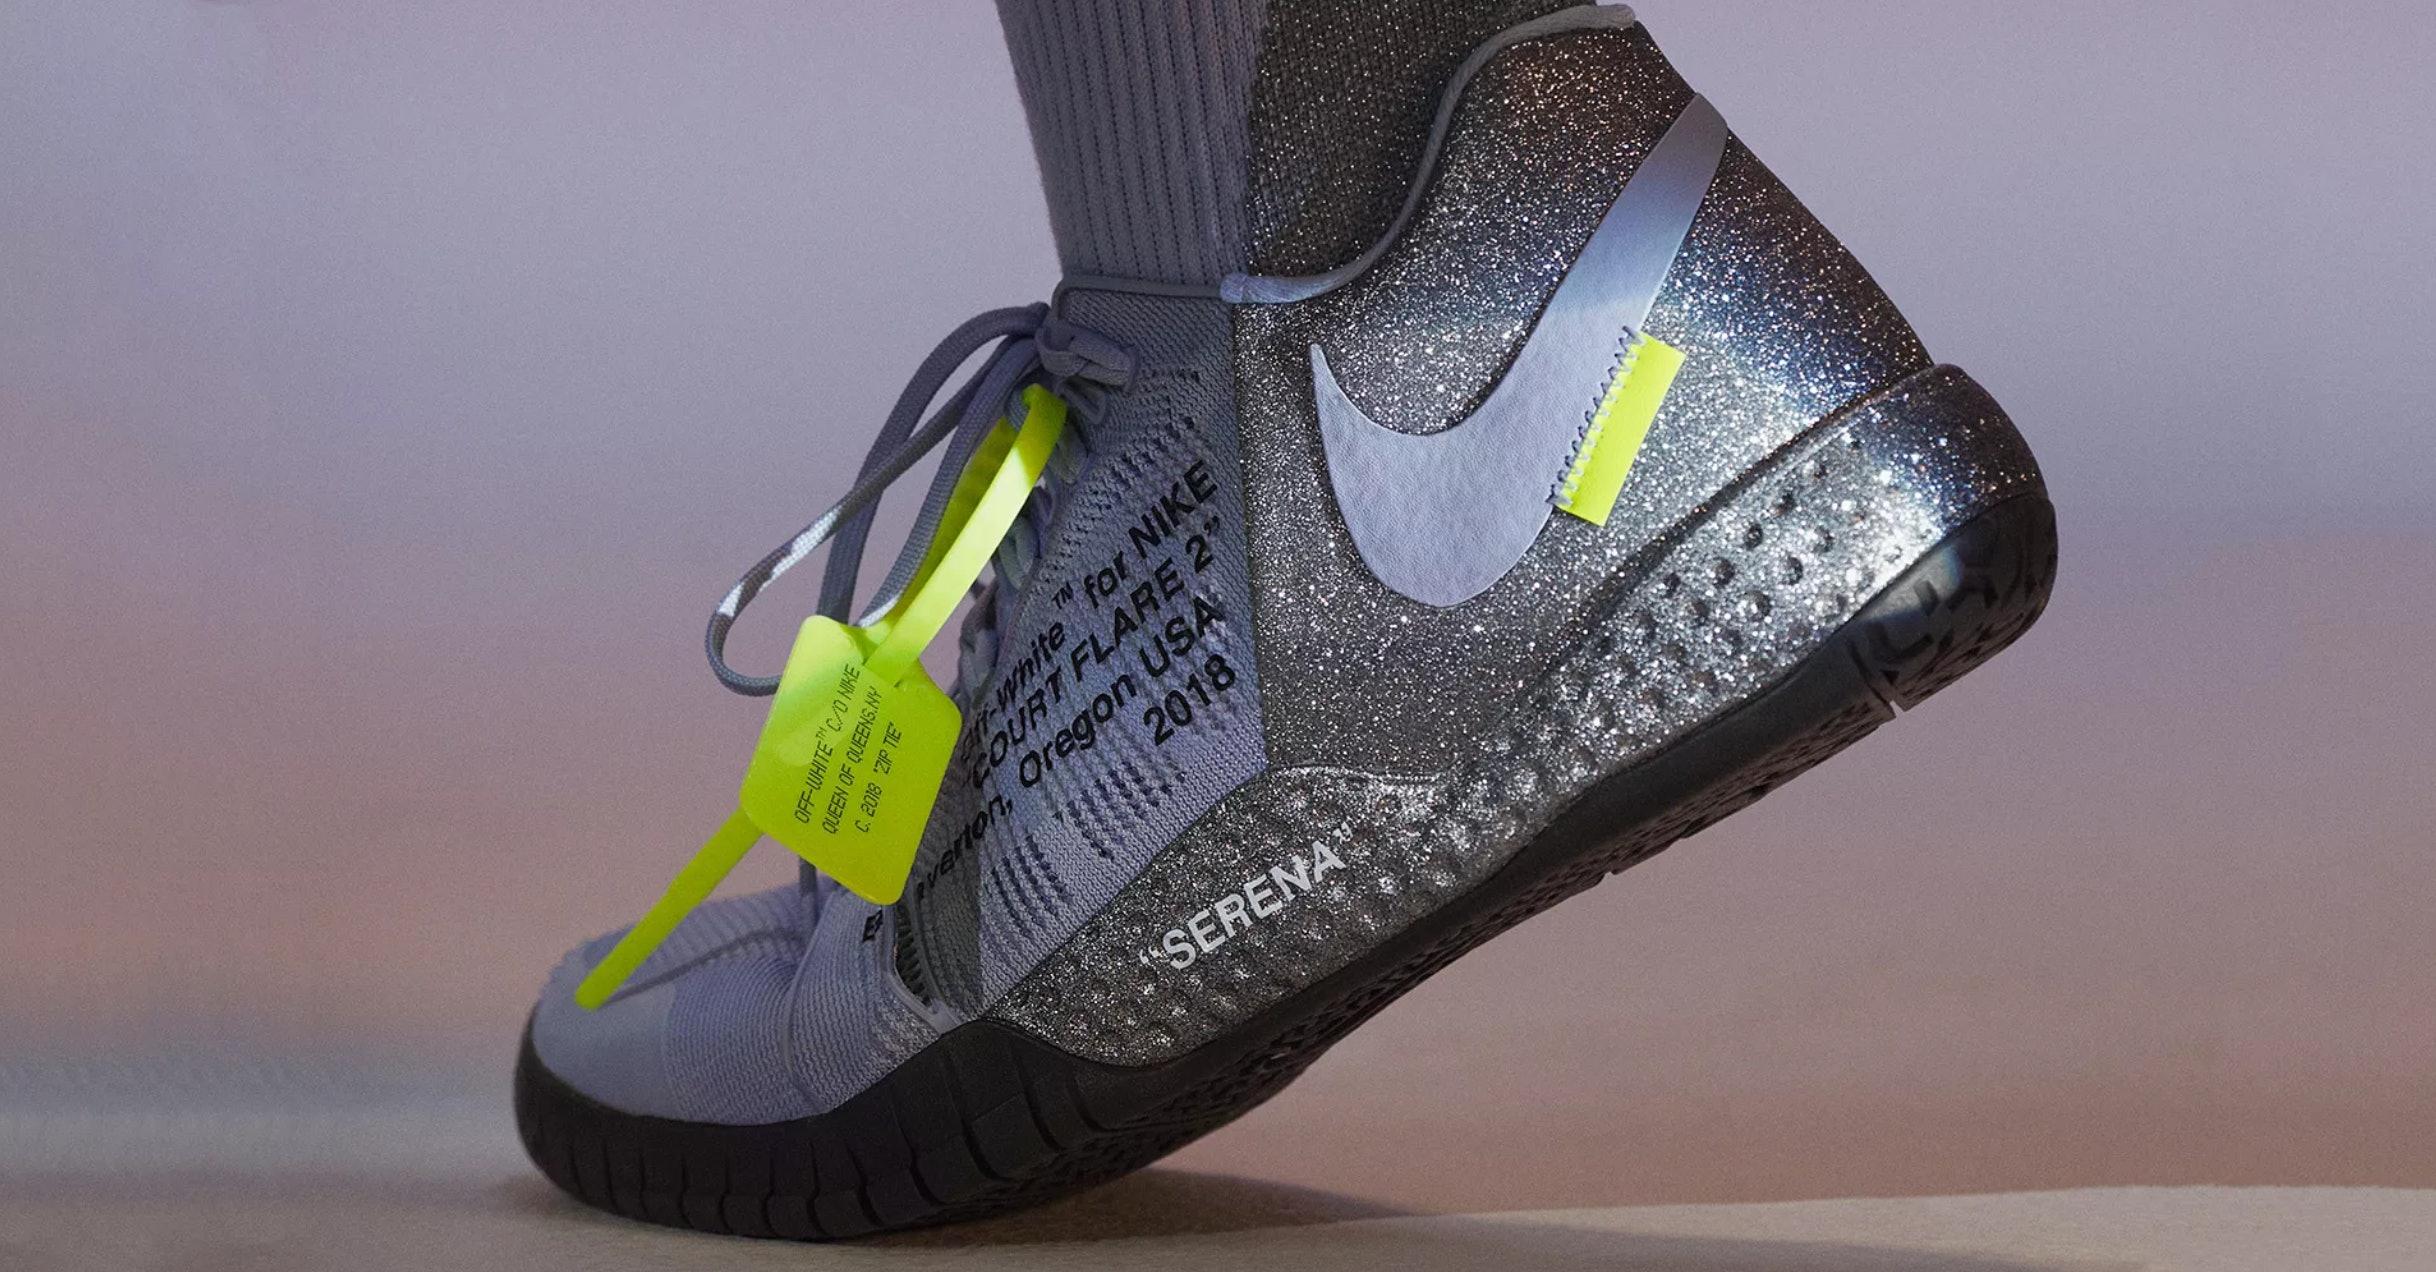 The Nike x Virgil Abloh for Serena